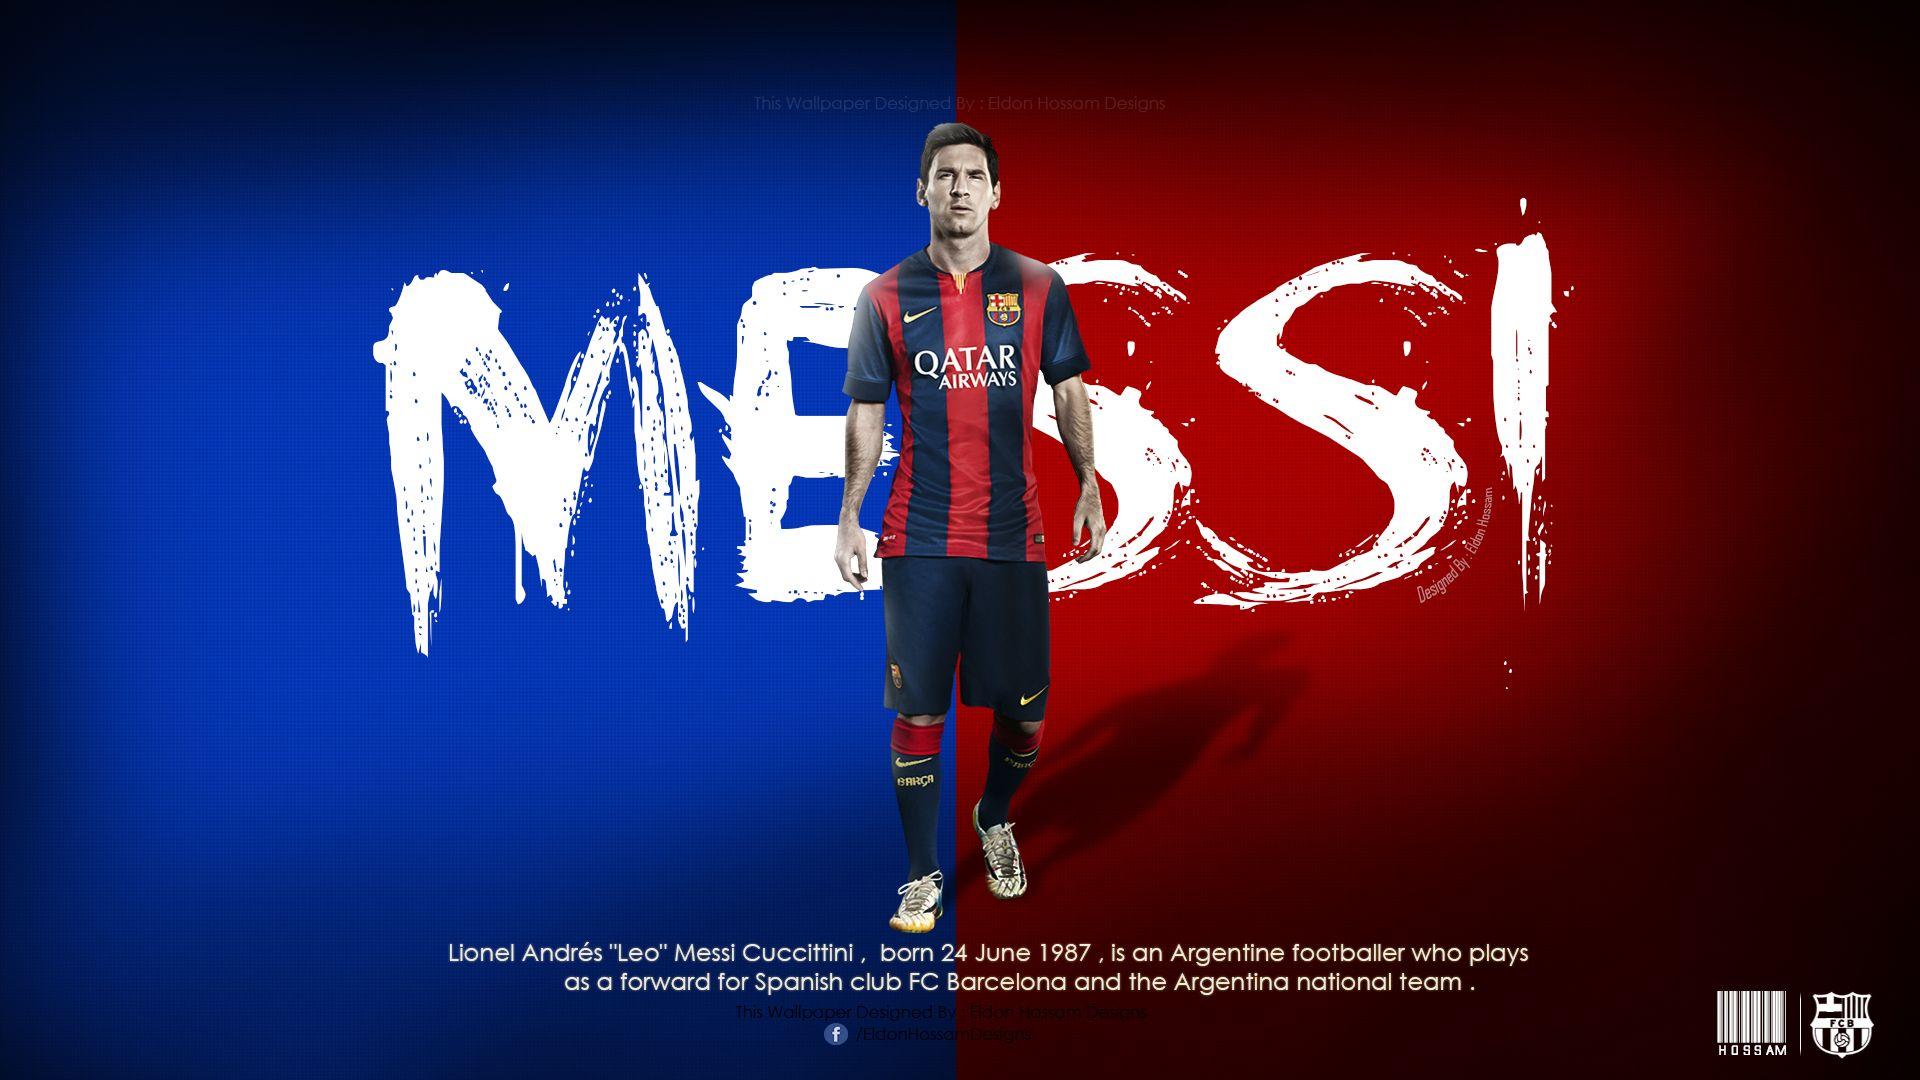 Messi New Wallpaper Best Wallpaper Hd Lionel Messi Wallpapers Lionel Messi Messi